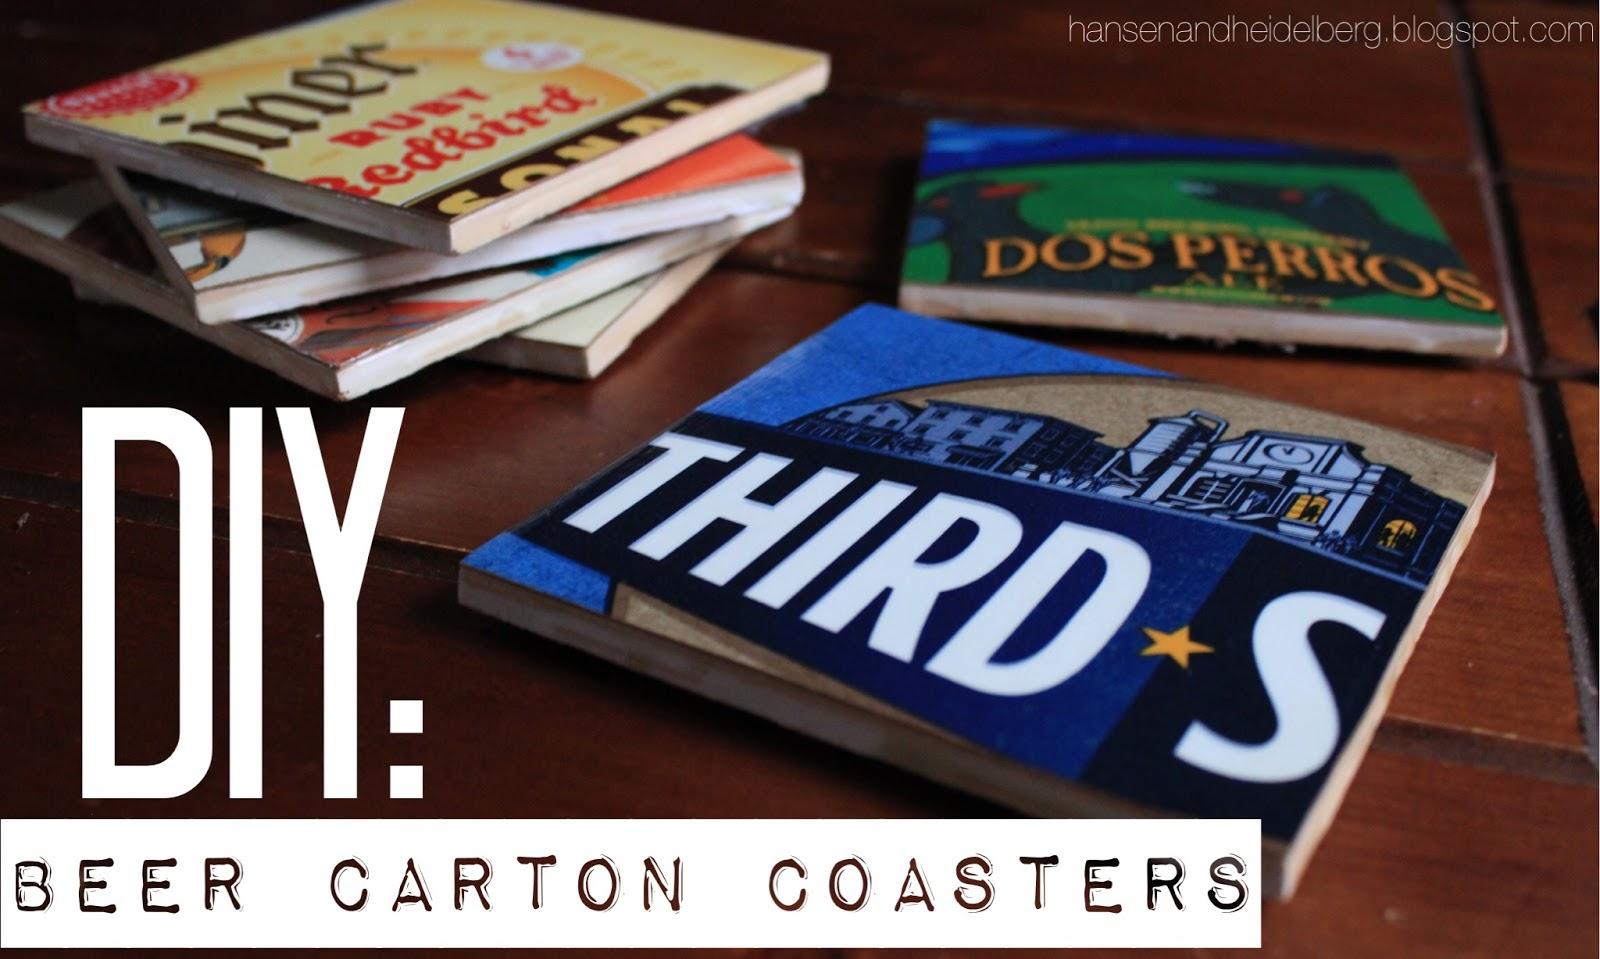 diy beer carton coasters, men's gifts, diy gifts